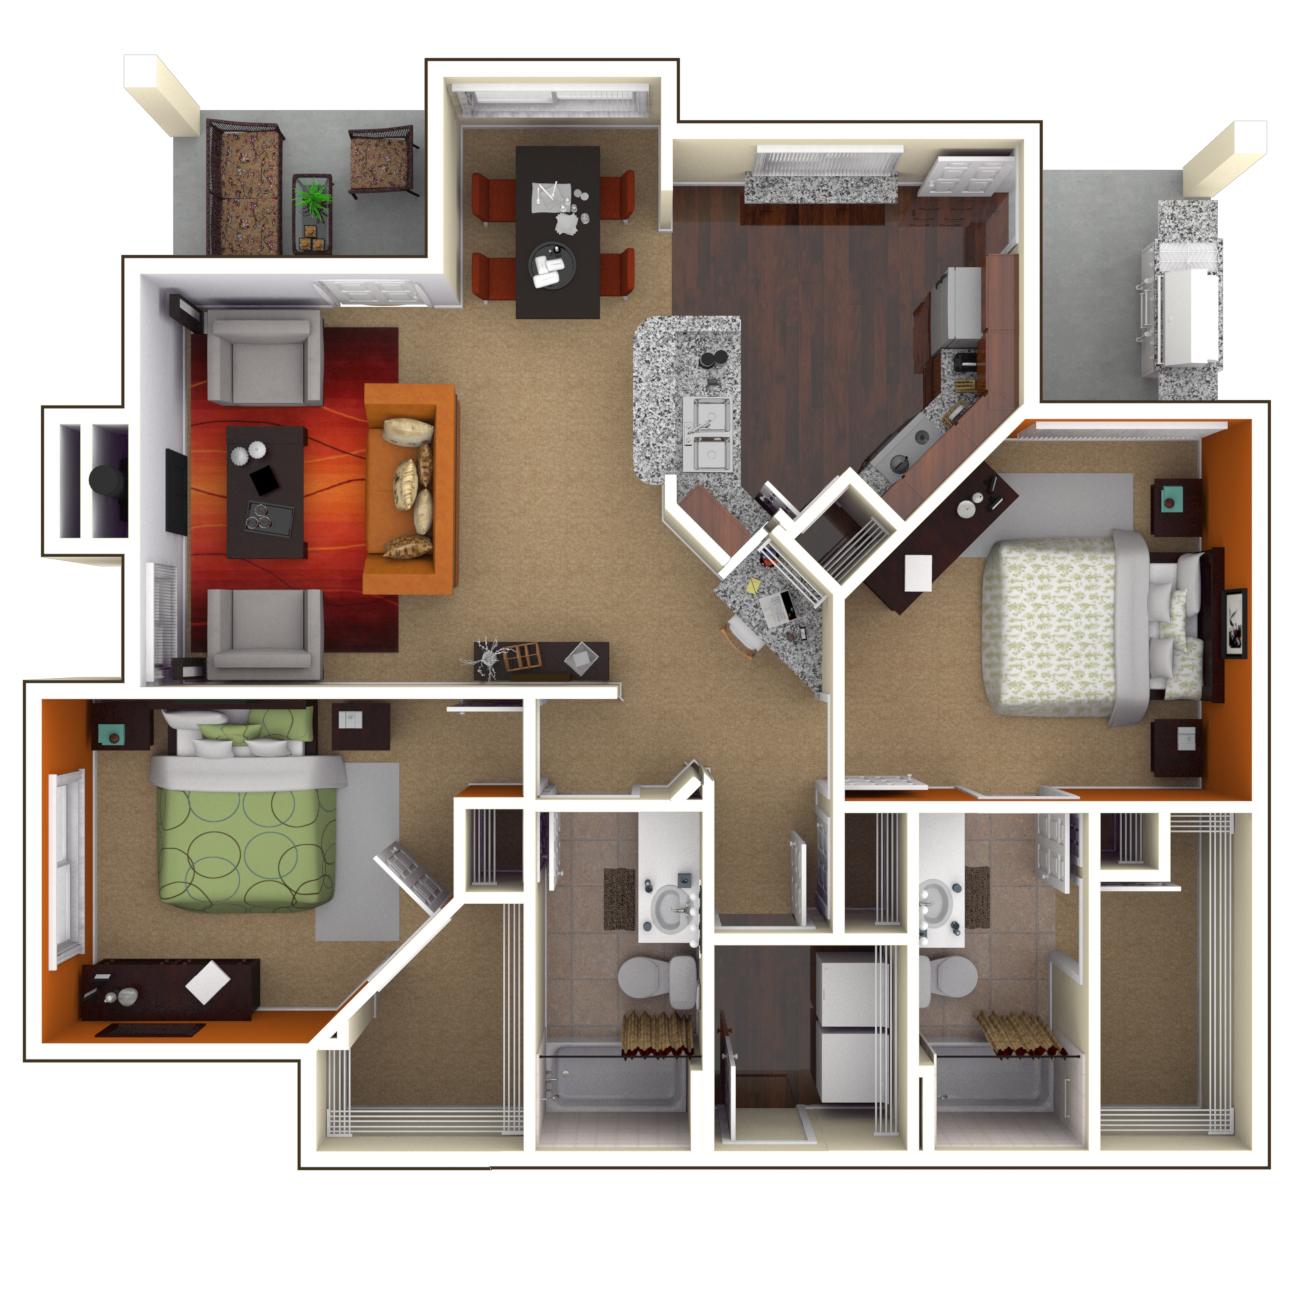 OFallon IL Luxury Apartments - Parkway Lakeside Floor Plans